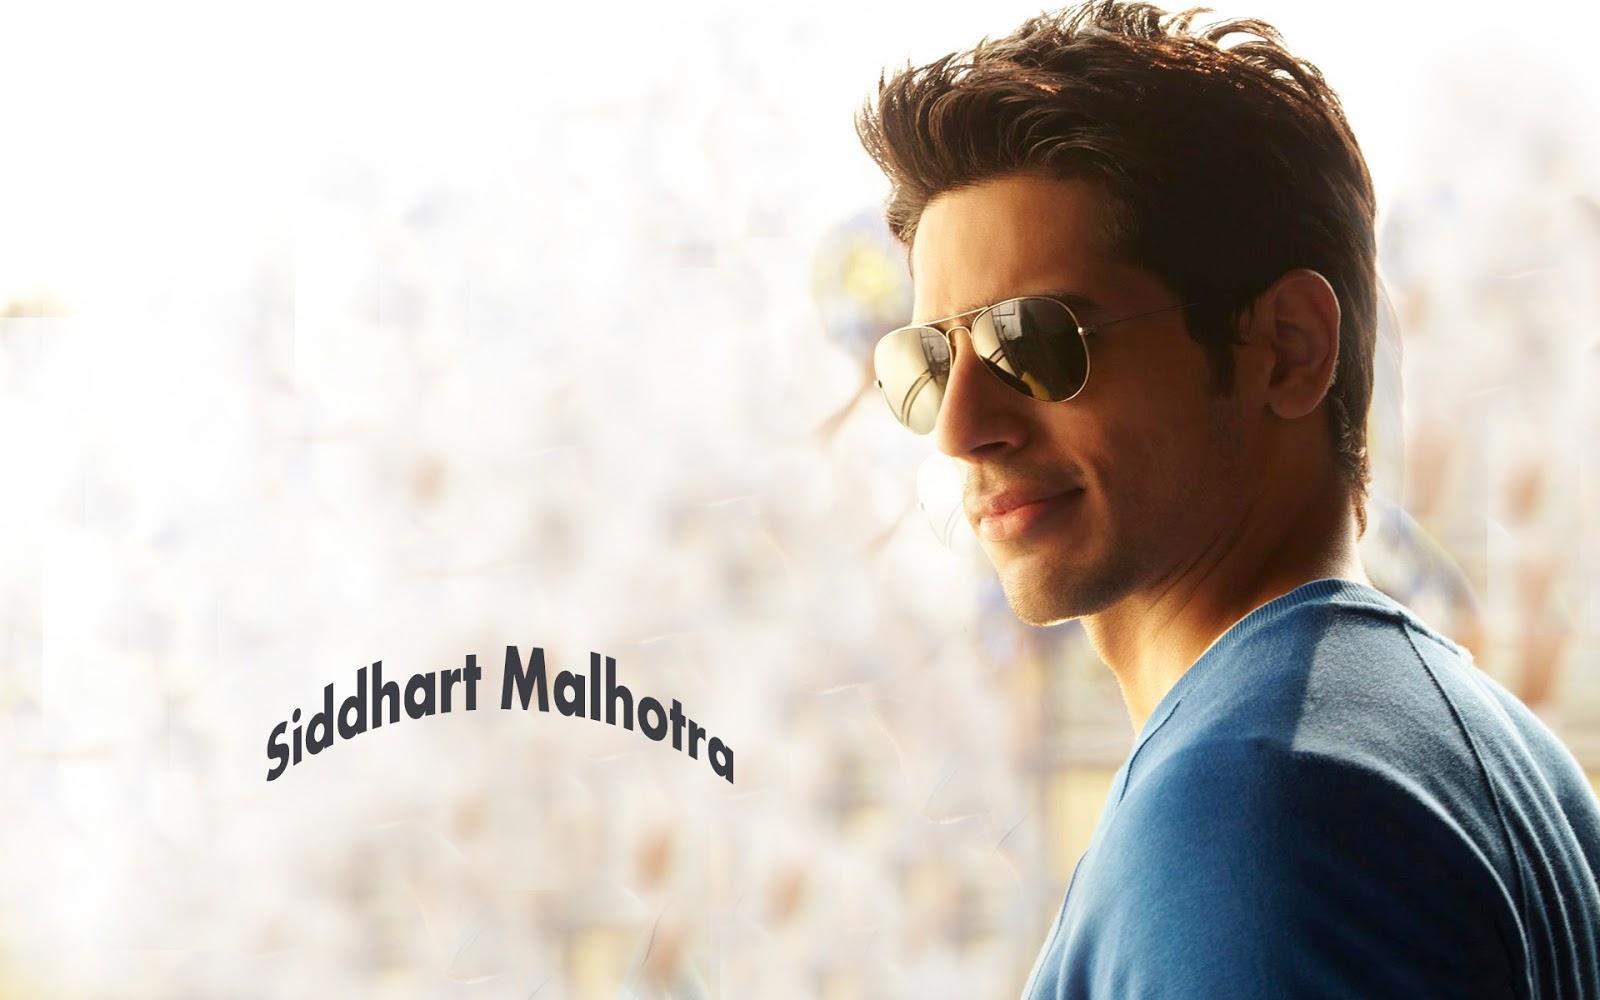 Siddharth Malhotra HD Wallpapers Free Download